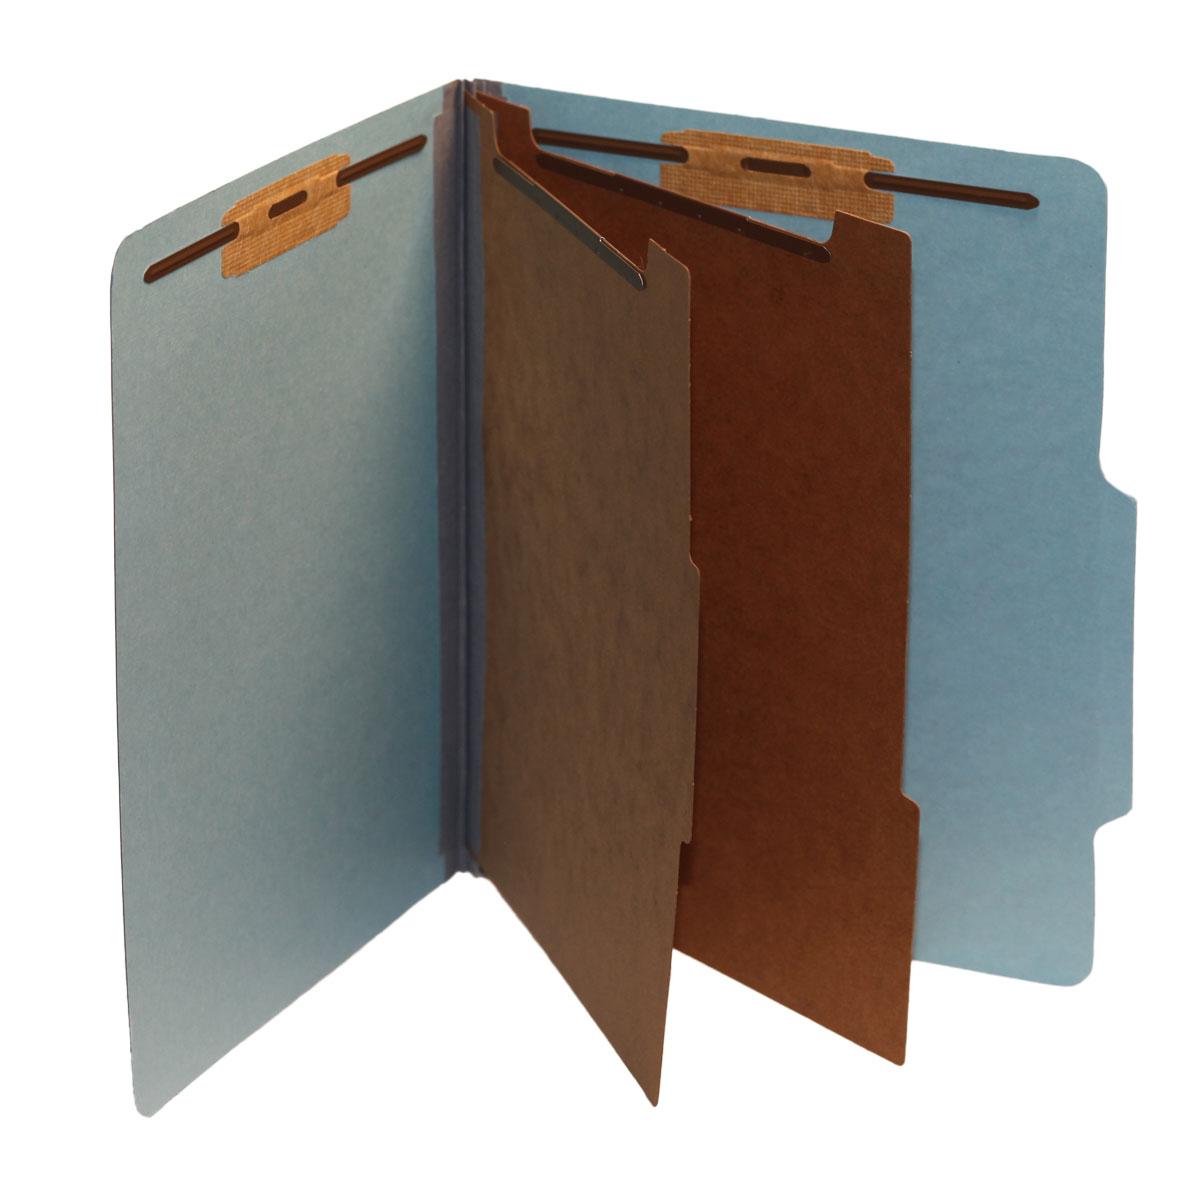 Top Tab Folders, 2 Dividers